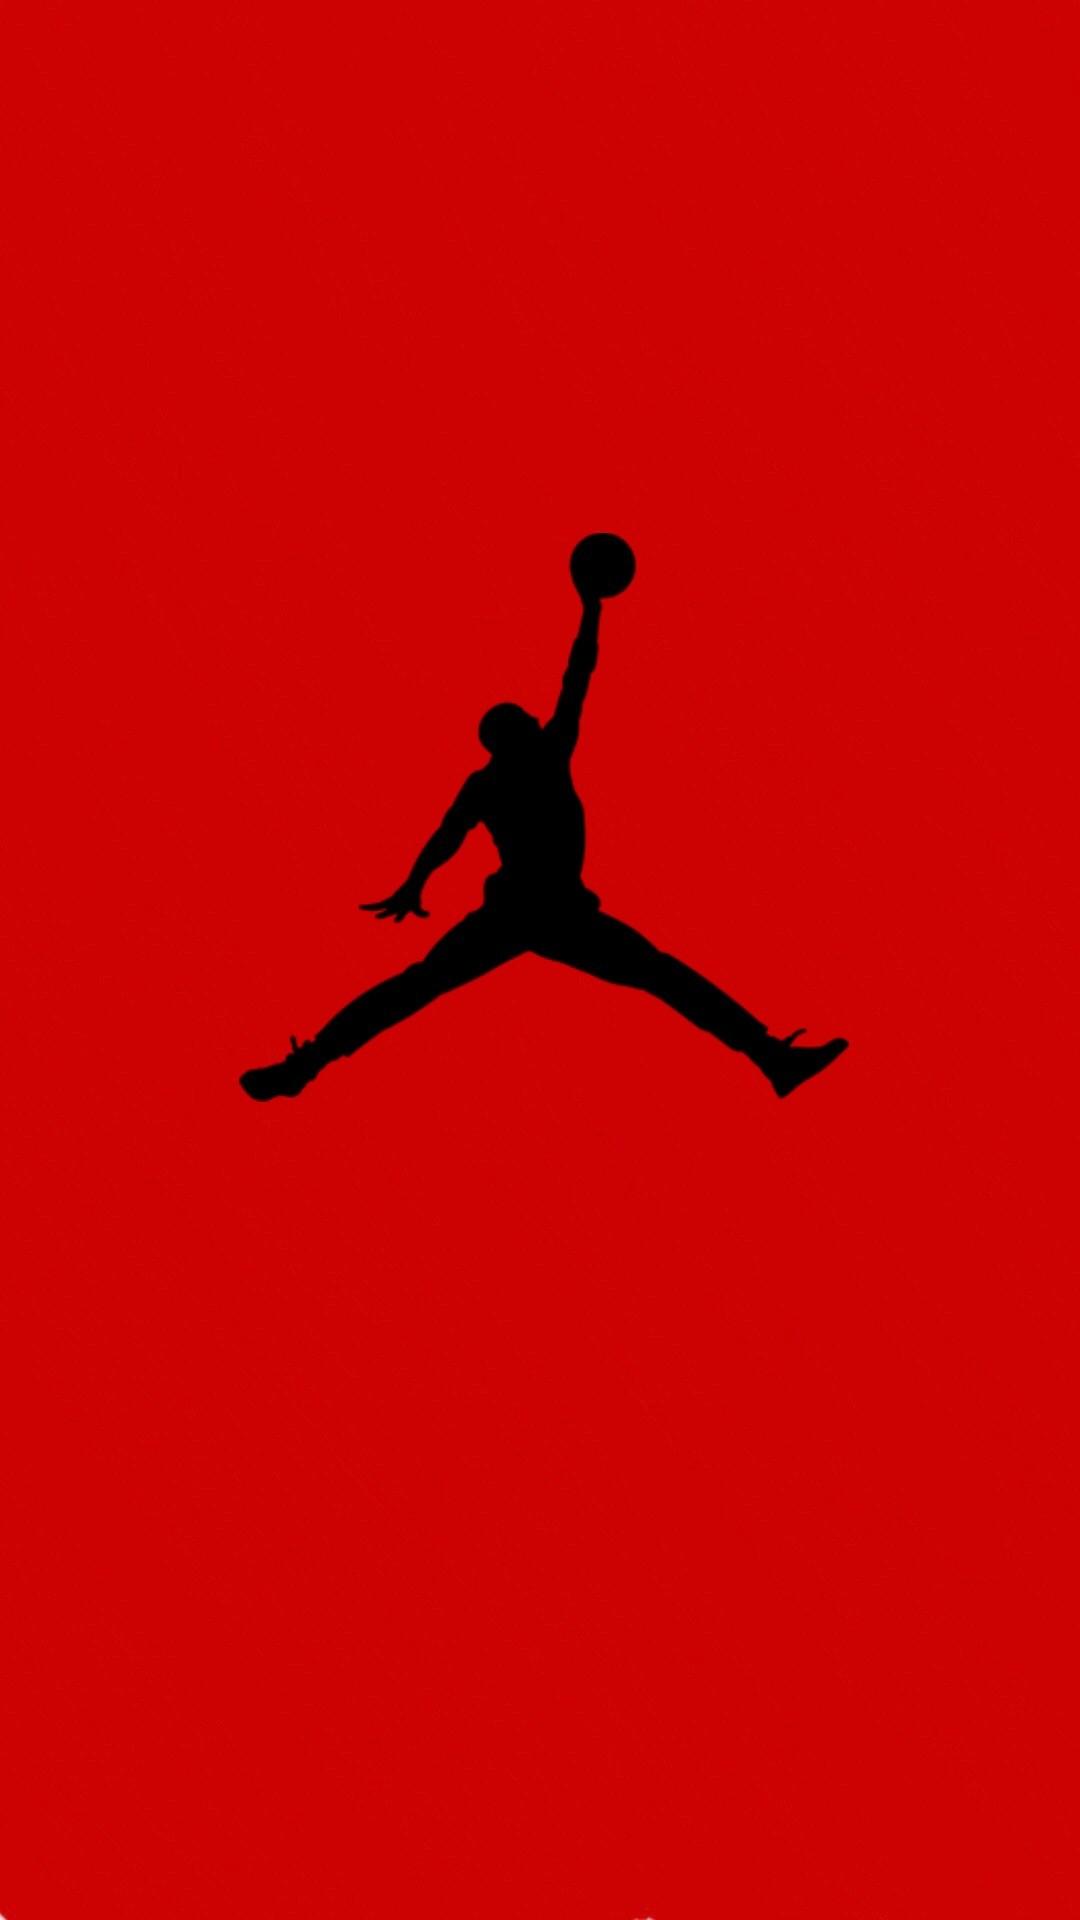 size 40 4aa29 187fb 1080x1920 Air jordan logo iphone background